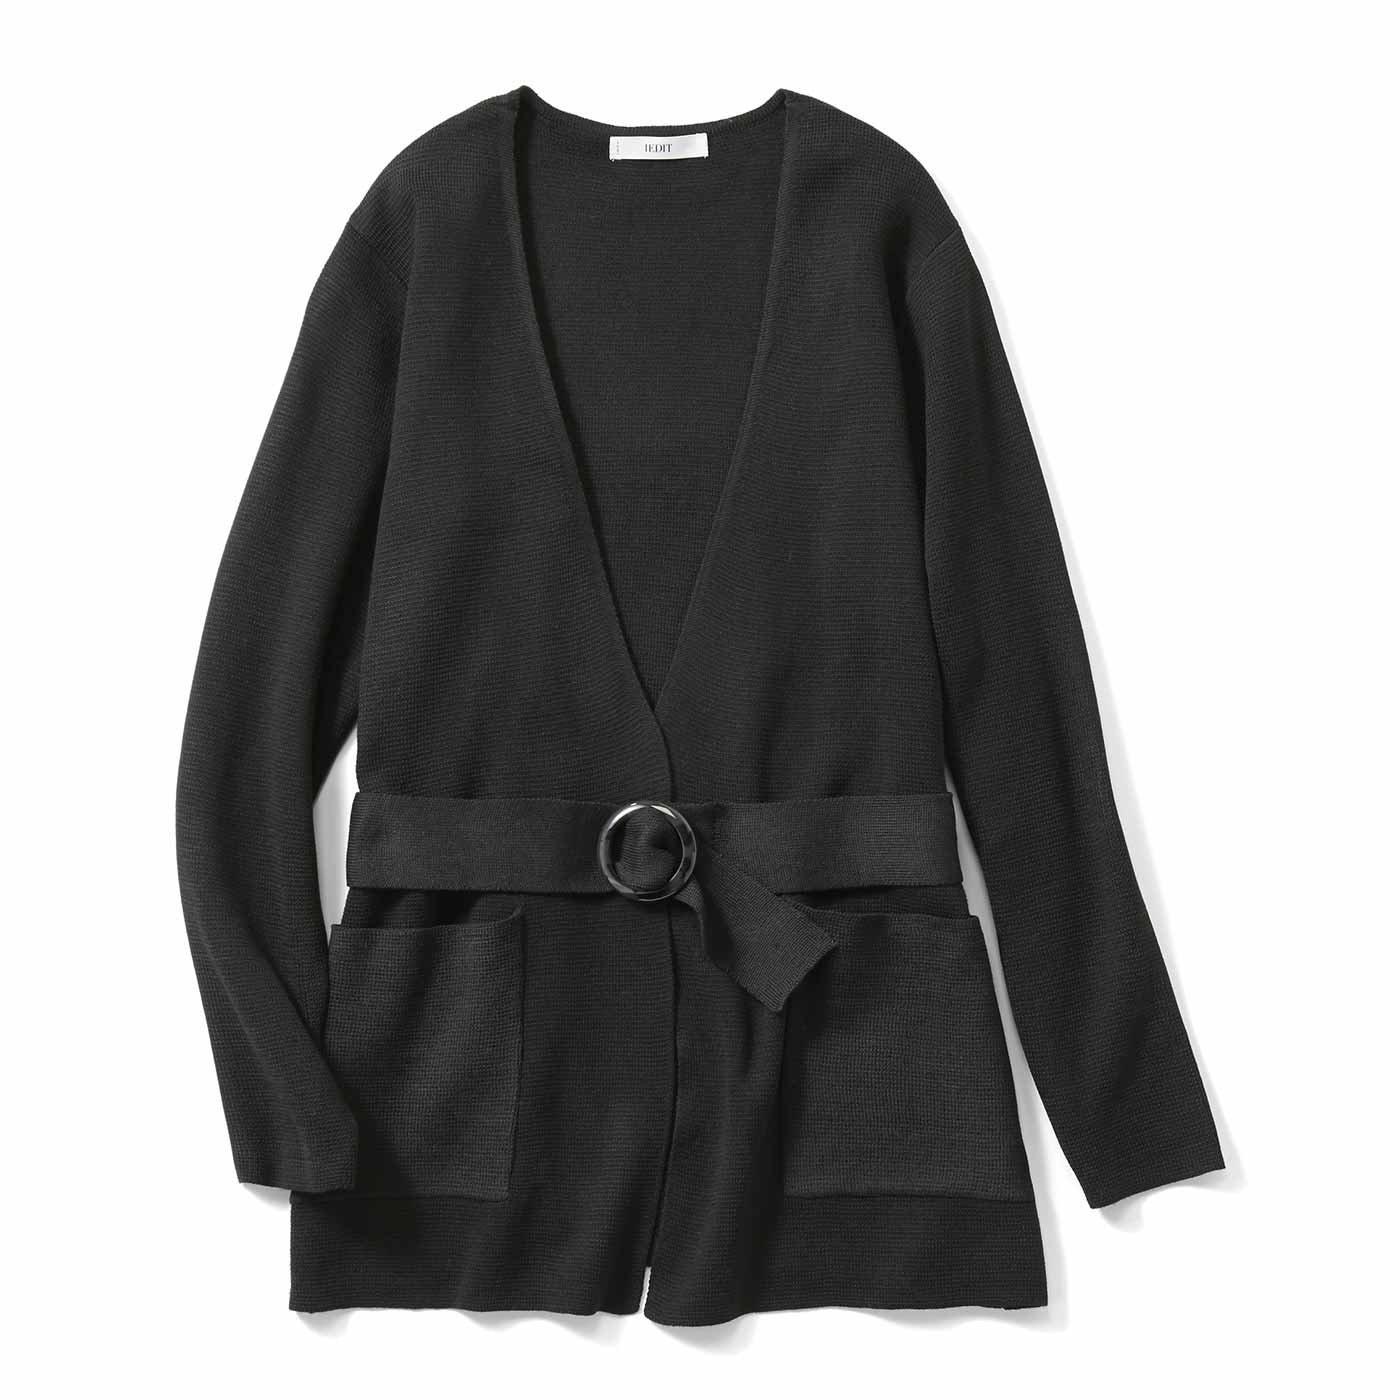 IEDIT[イディット] ベルト付きノーカラーミラノリブニットジャケット〈ブラック〉